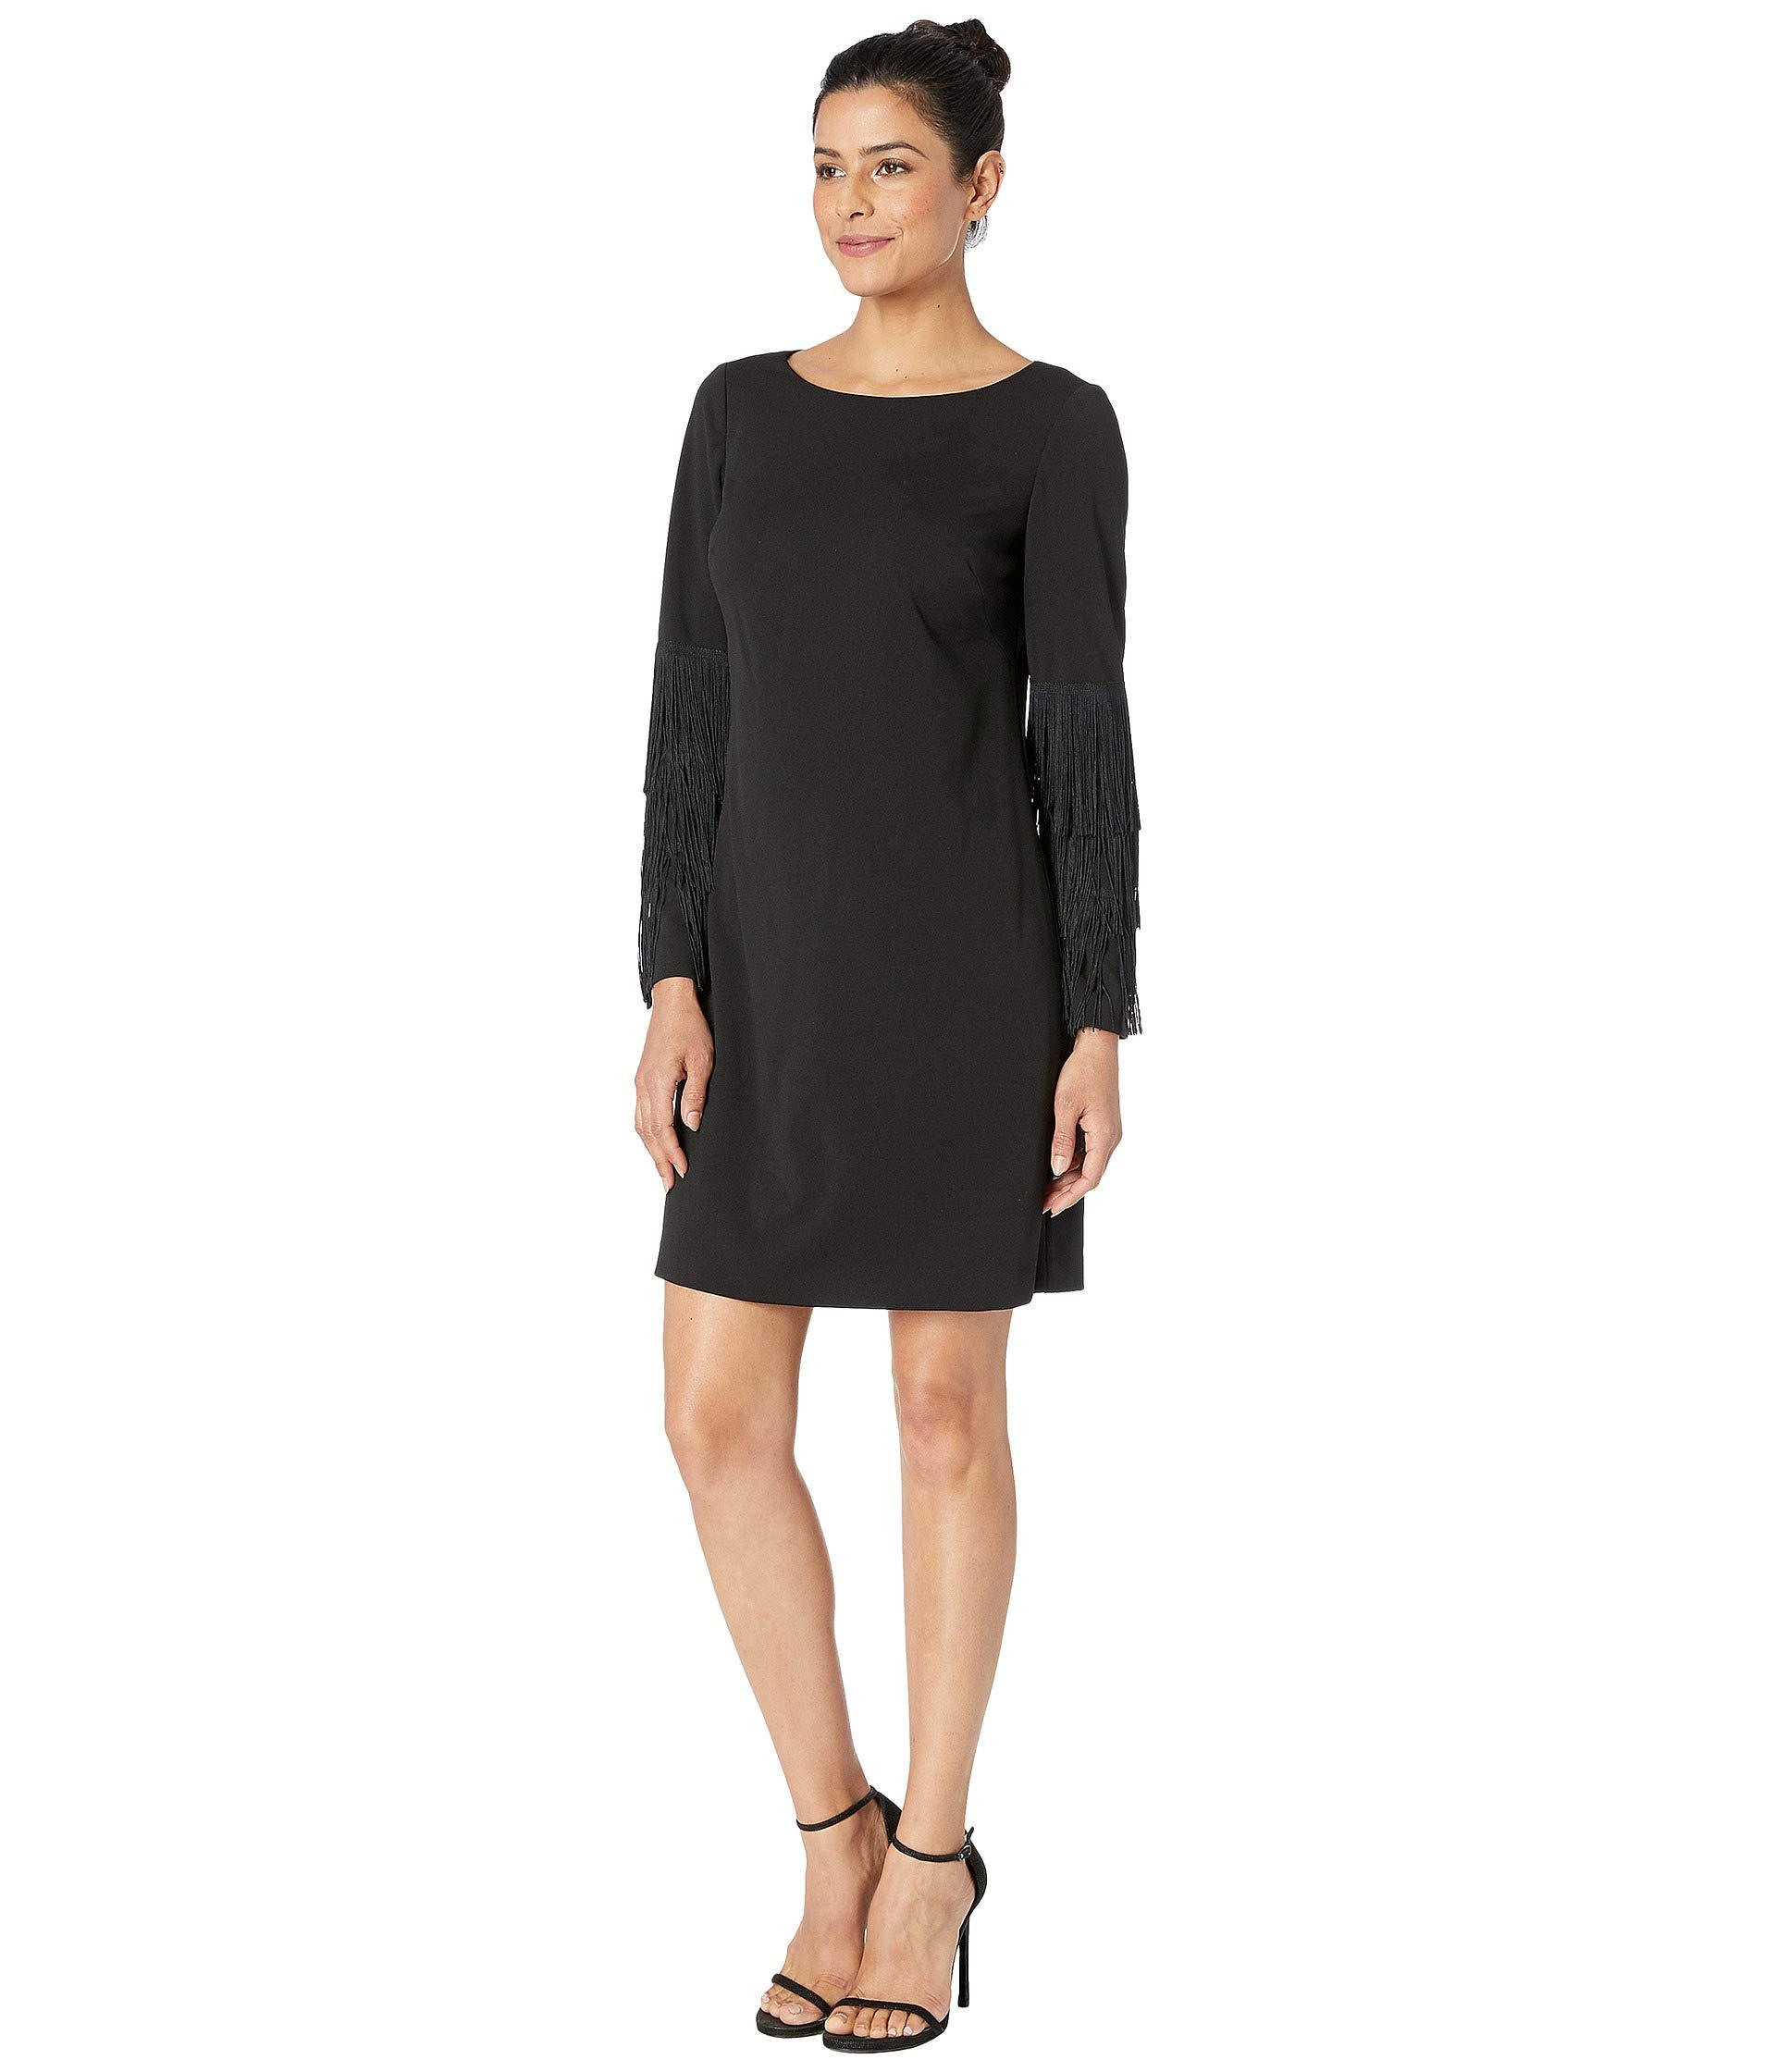 W Dress Shift Bateau Papell Adrianna Neckline Black Crepe Knit qwHXFcAf